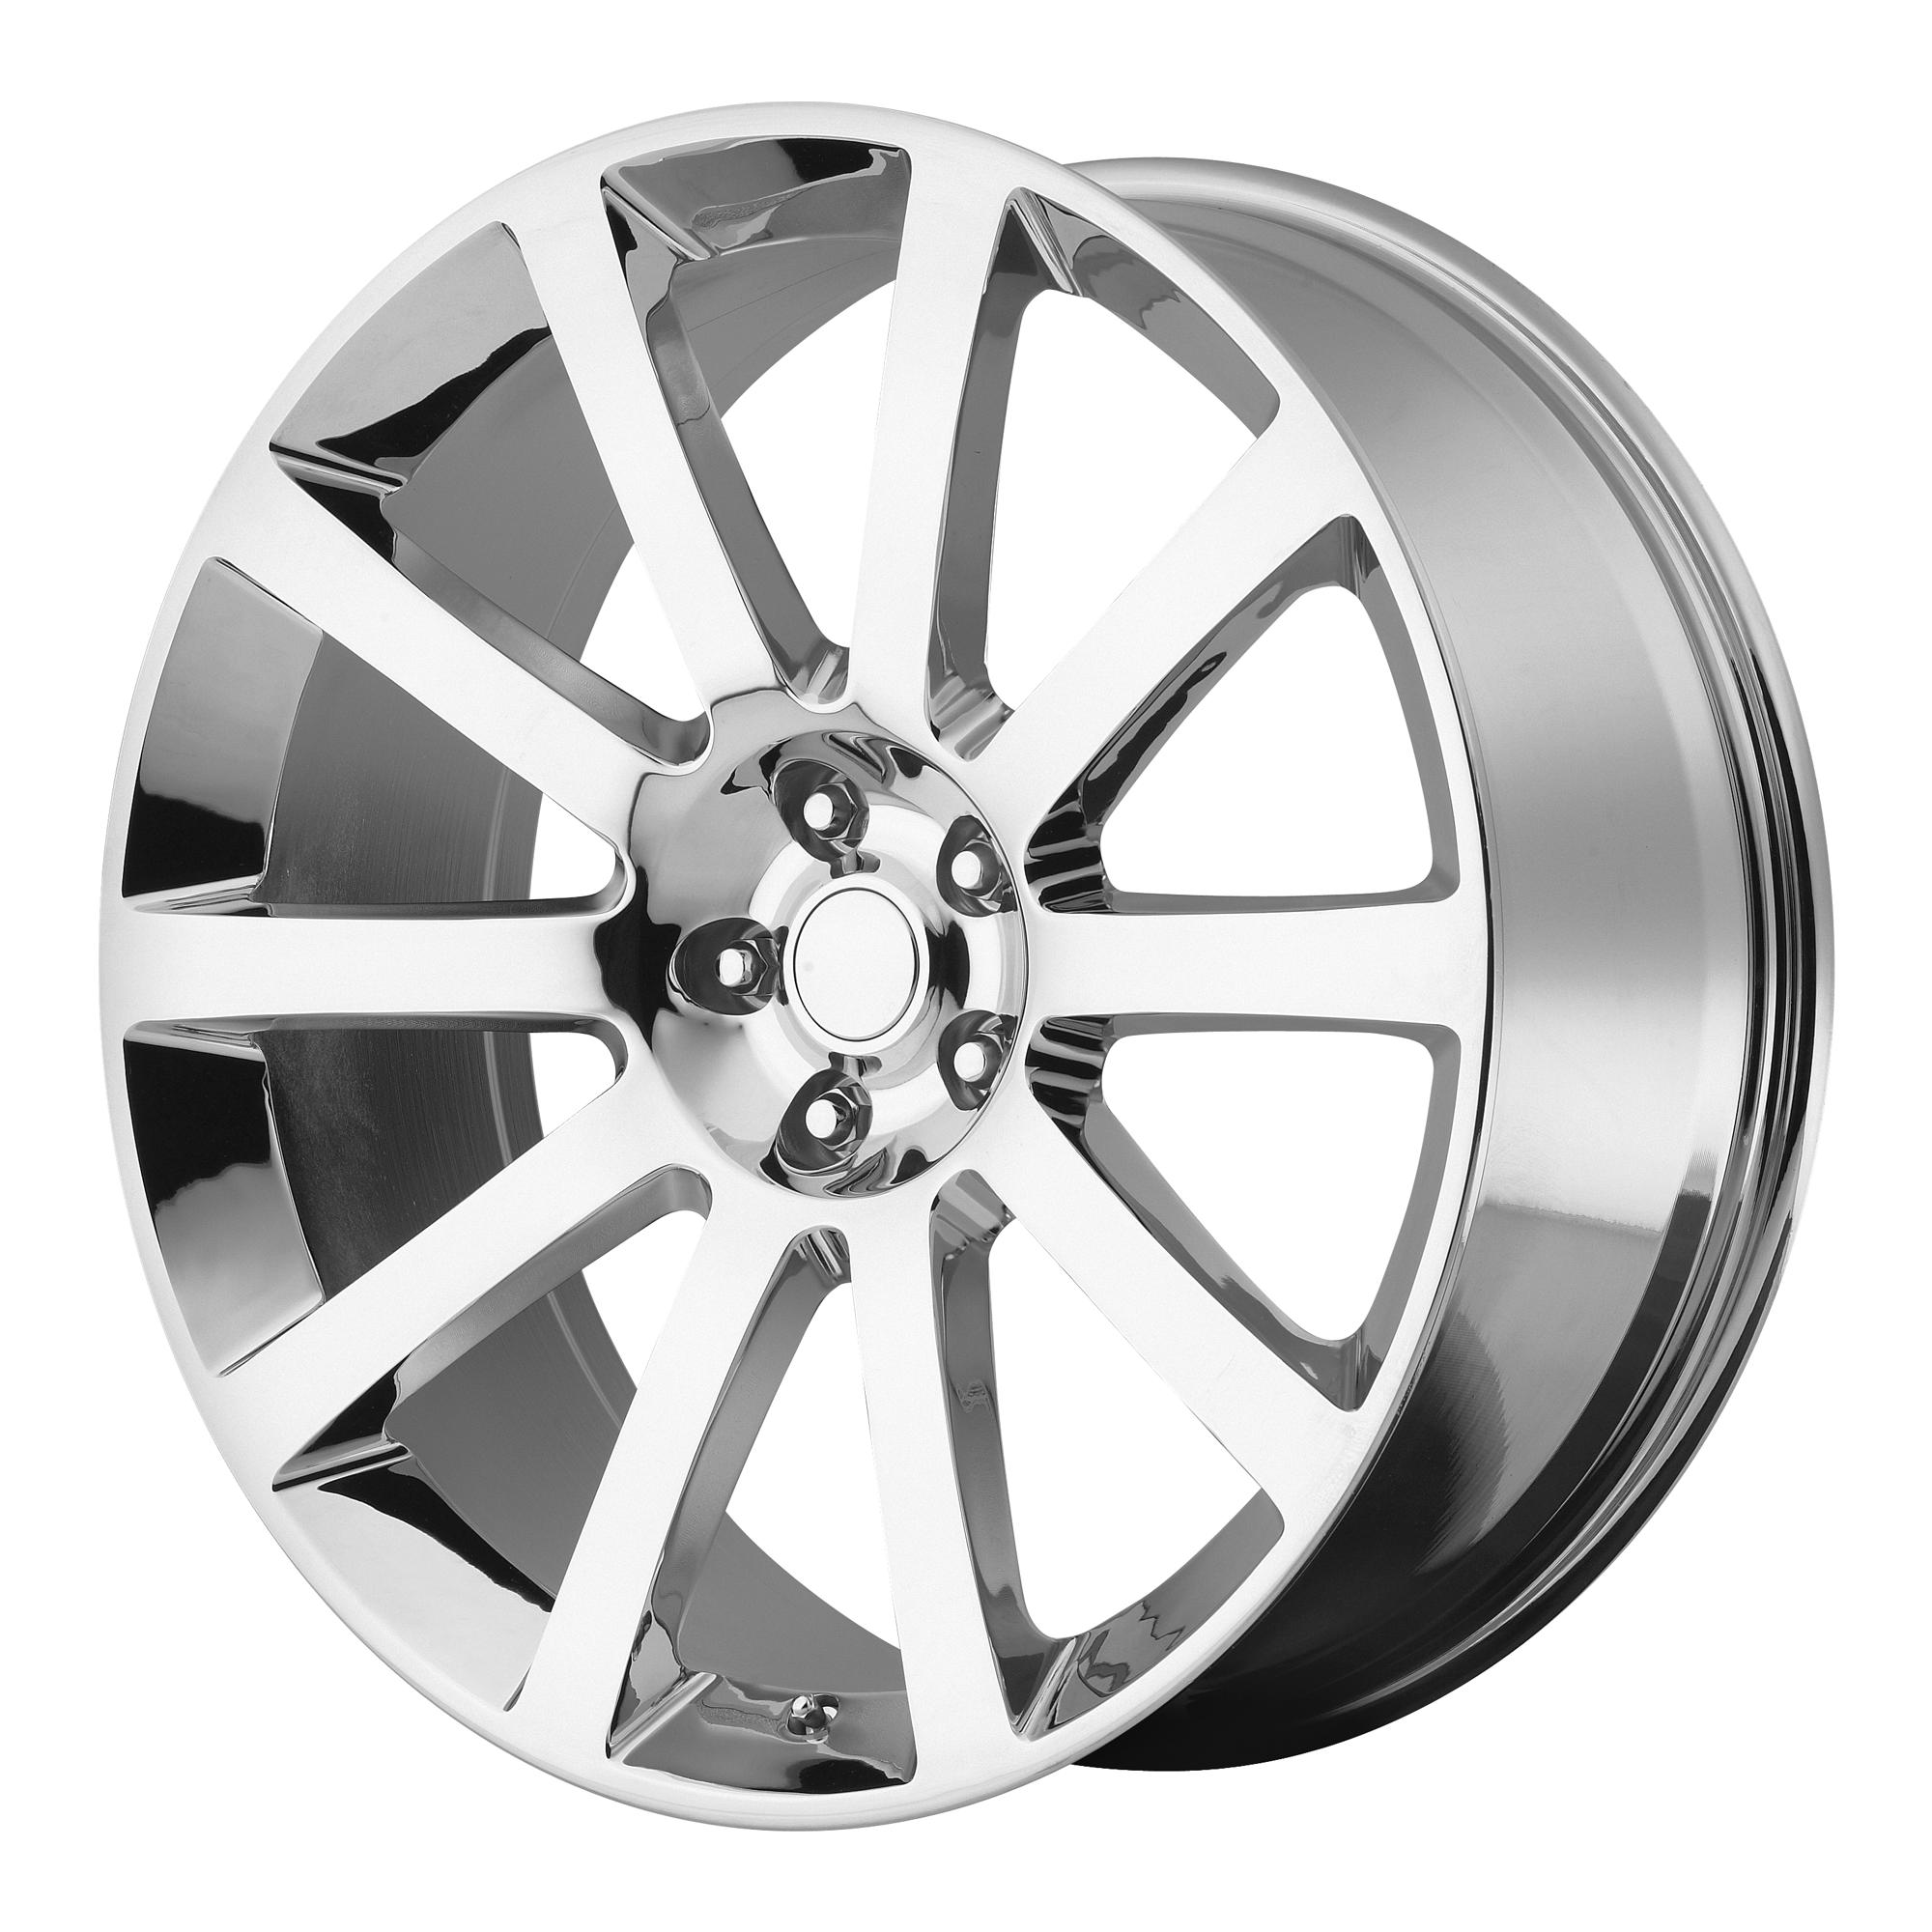 OE Creations Replica Wheels OE Creations PR146 Chrome